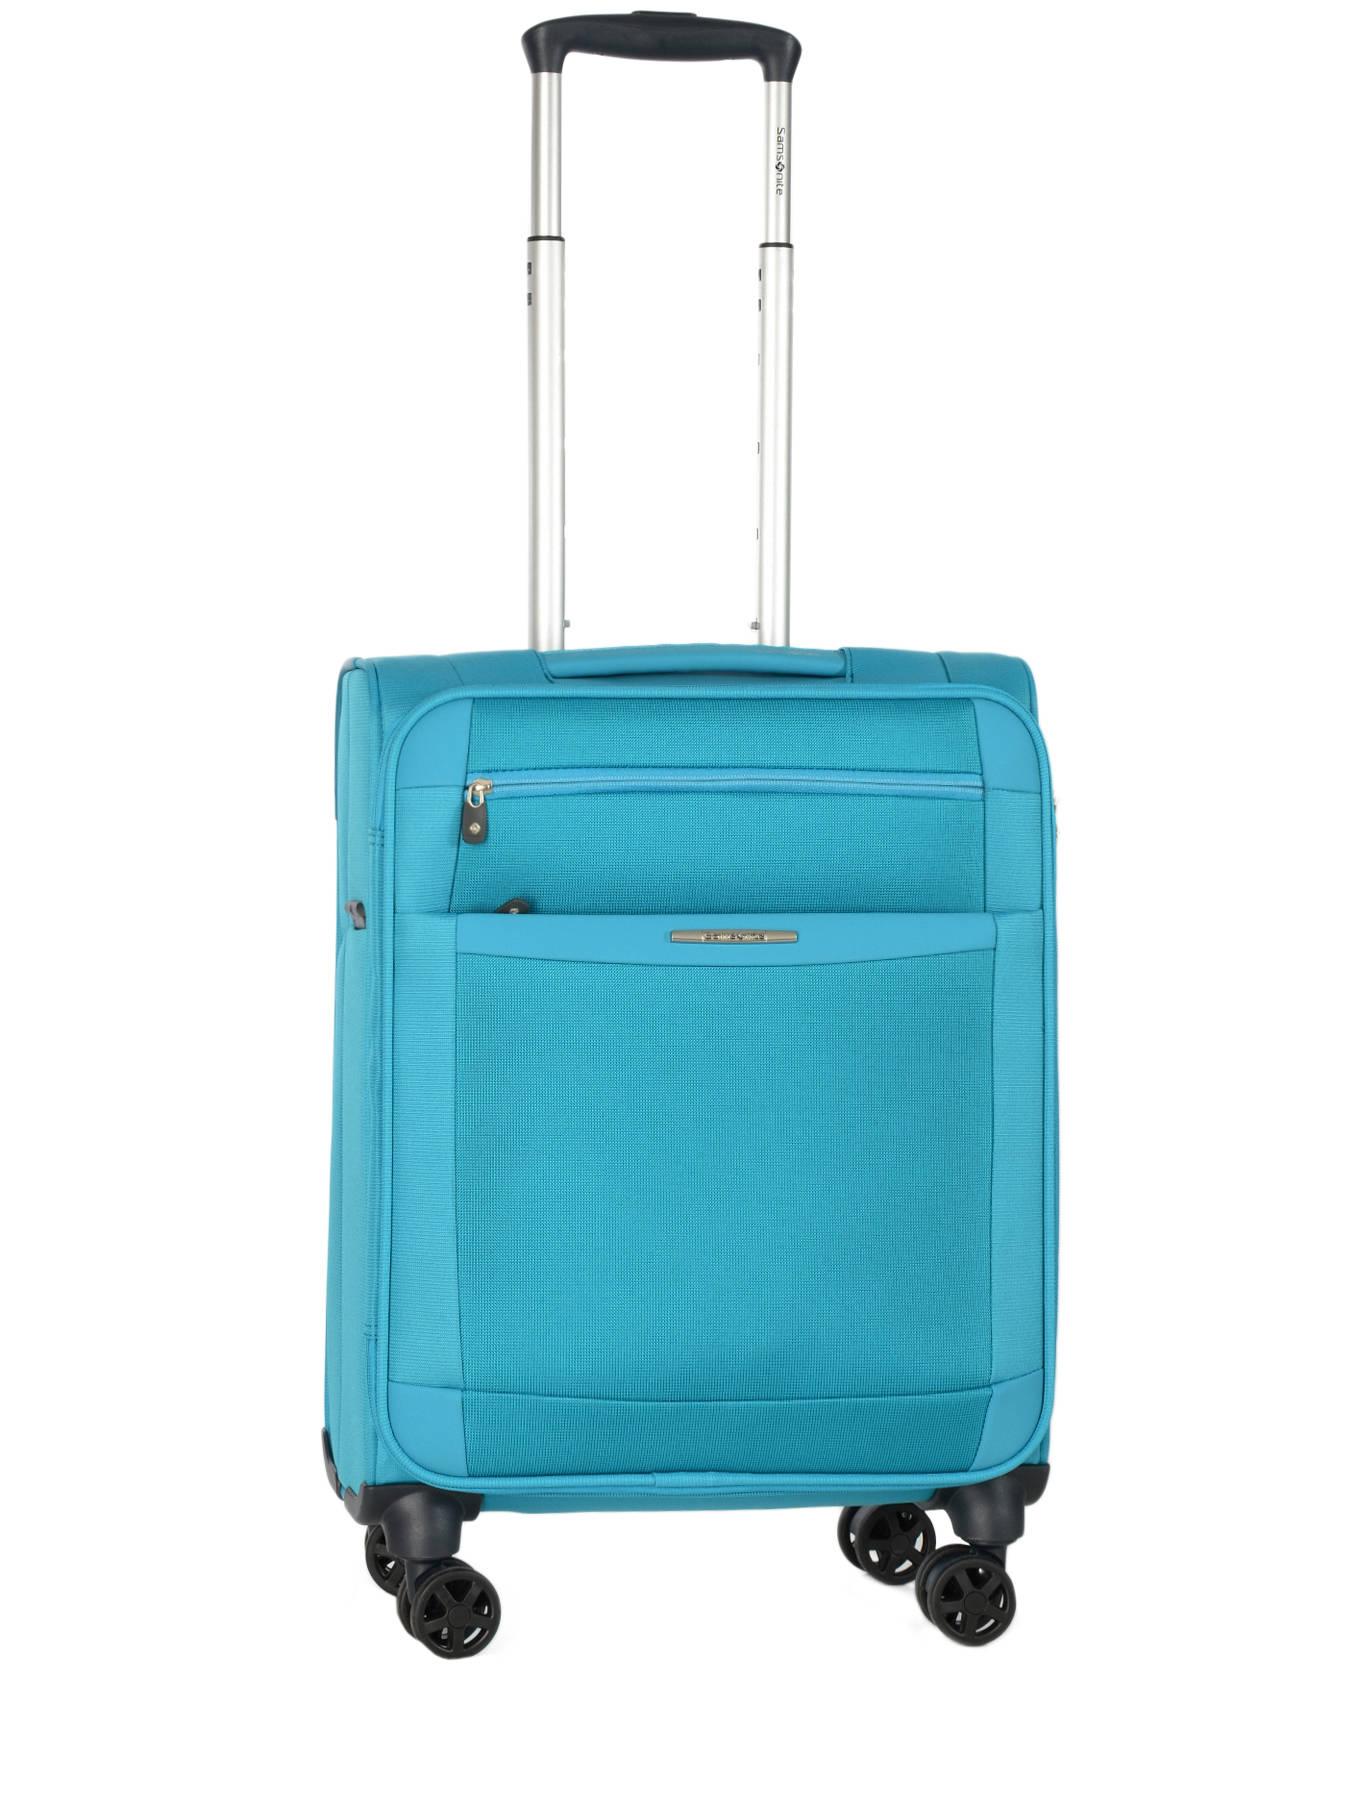 valise cabine samsonite dynamo dynamo sur. Black Bedroom Furniture Sets. Home Design Ideas